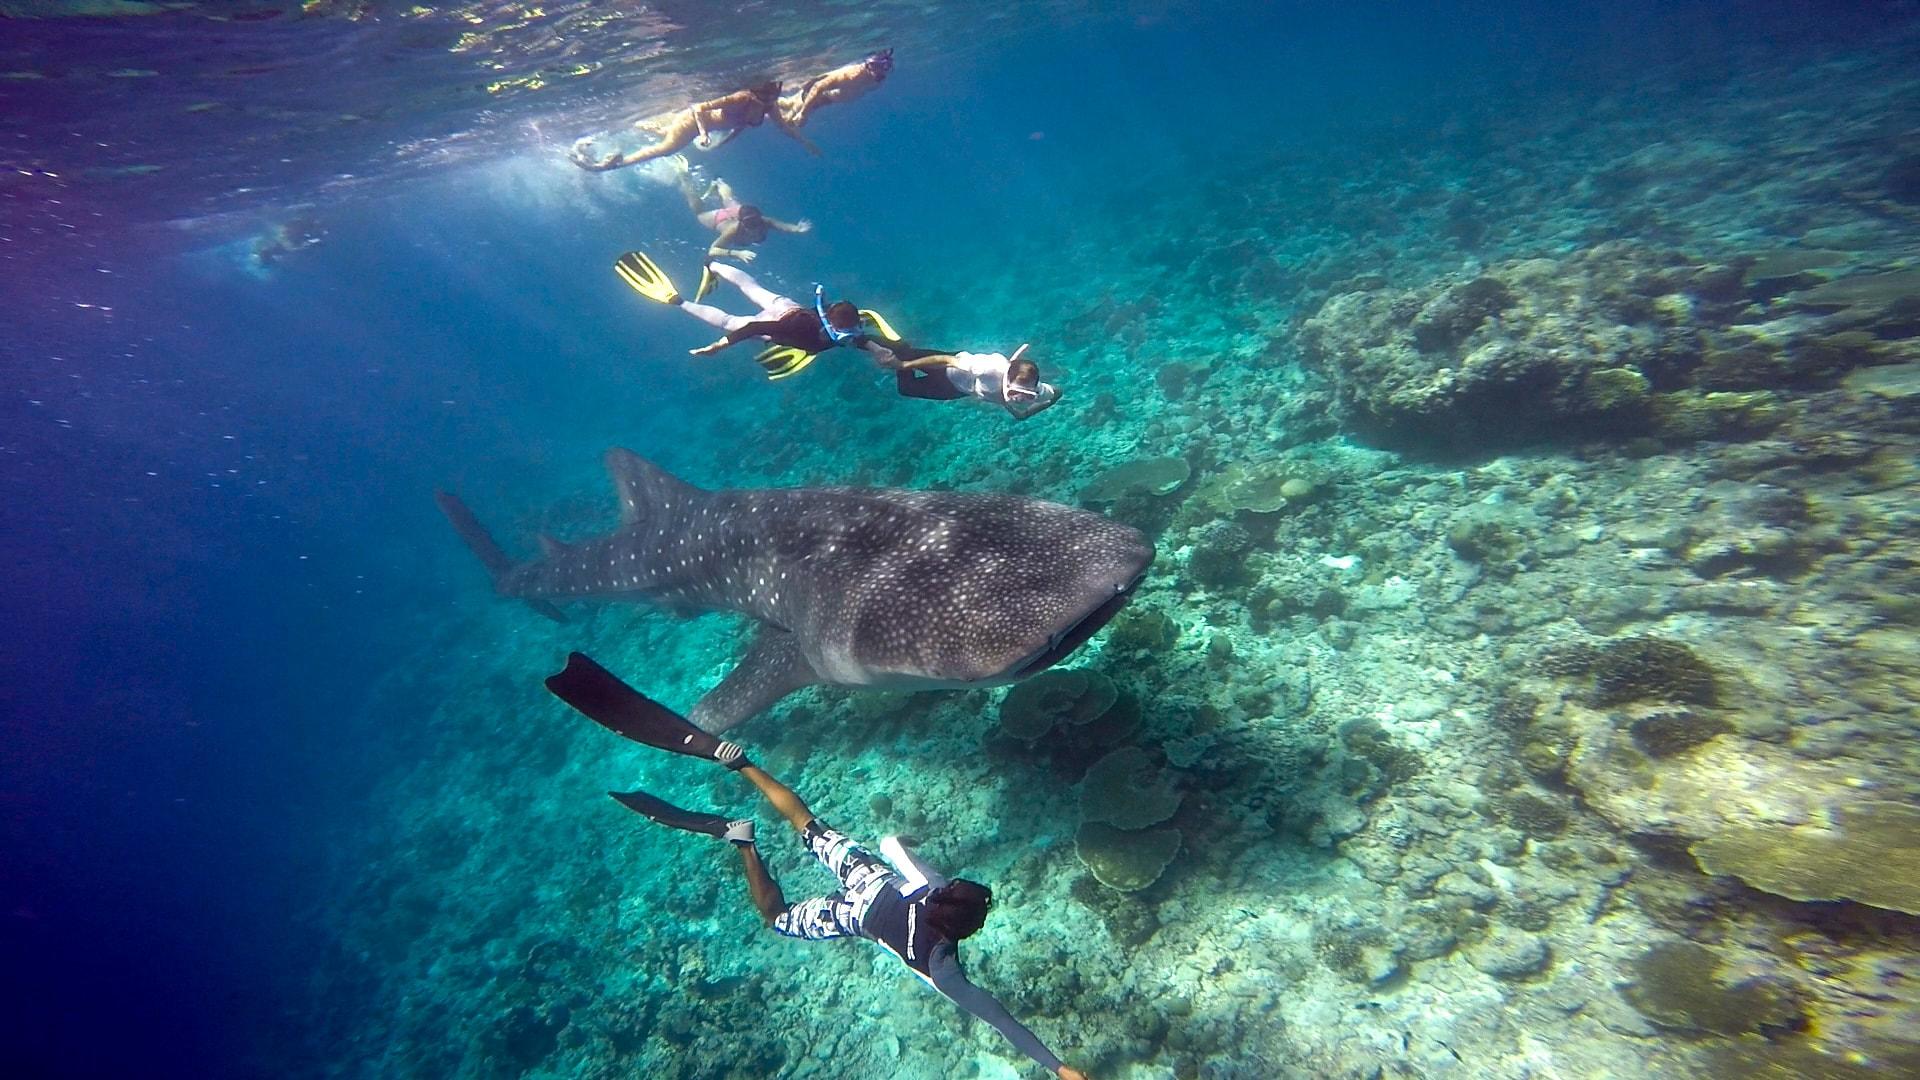 Snorkelers meet up with a whale shark in Hanifaru Bay.